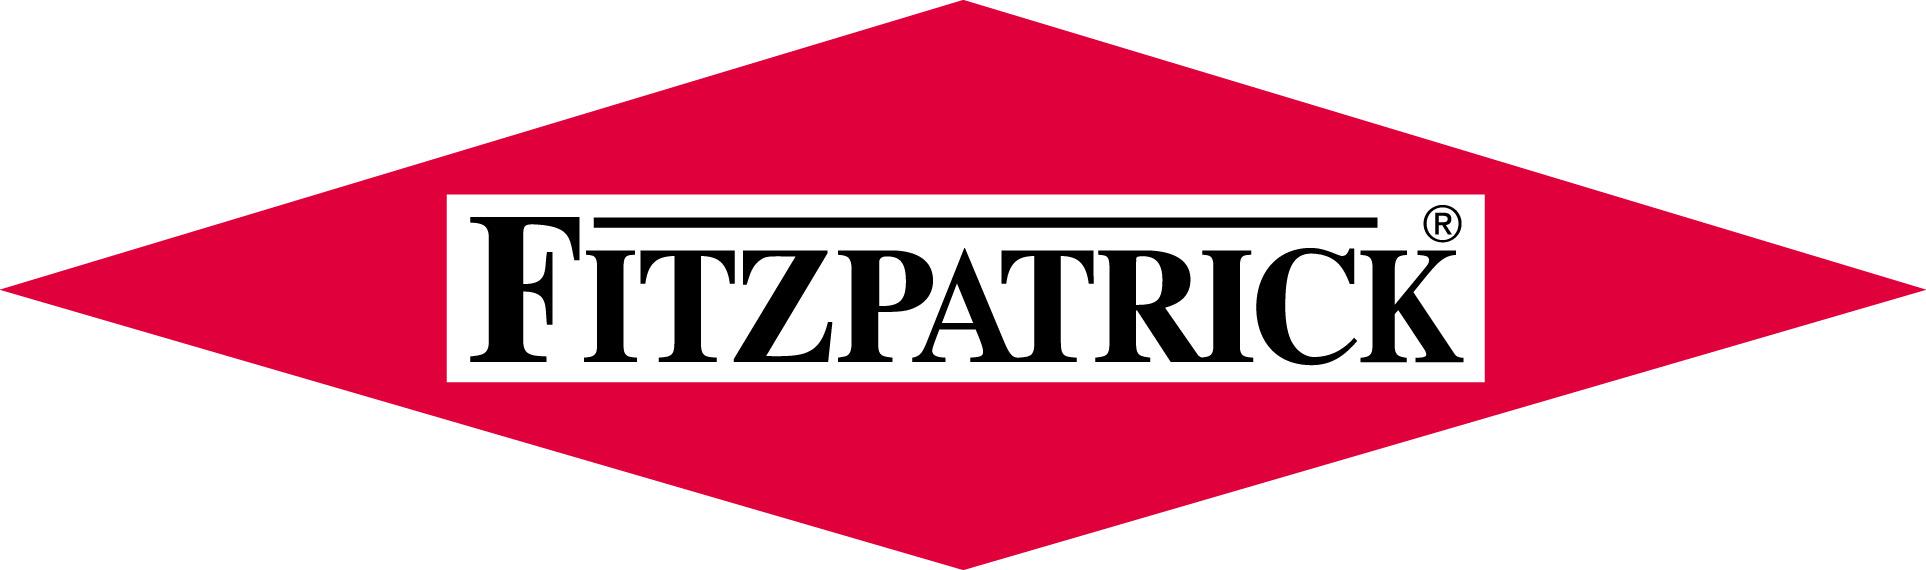 Fitzpatrick-logo